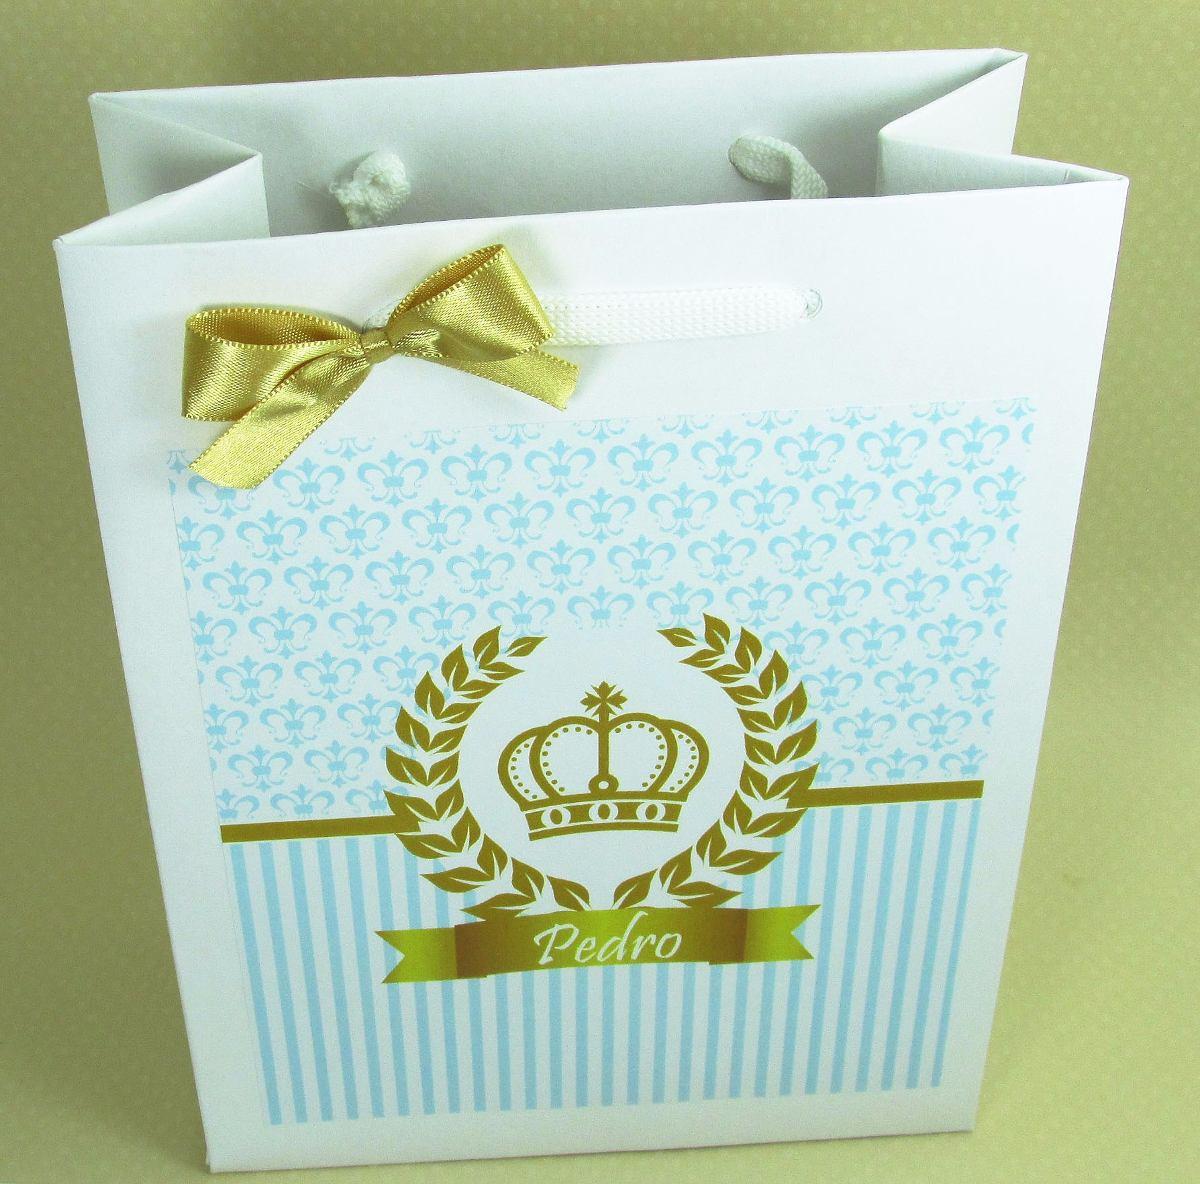 Bolsa De Papel Personalizada Casamento : Sacola de papel personalizada anivers casamento tam m